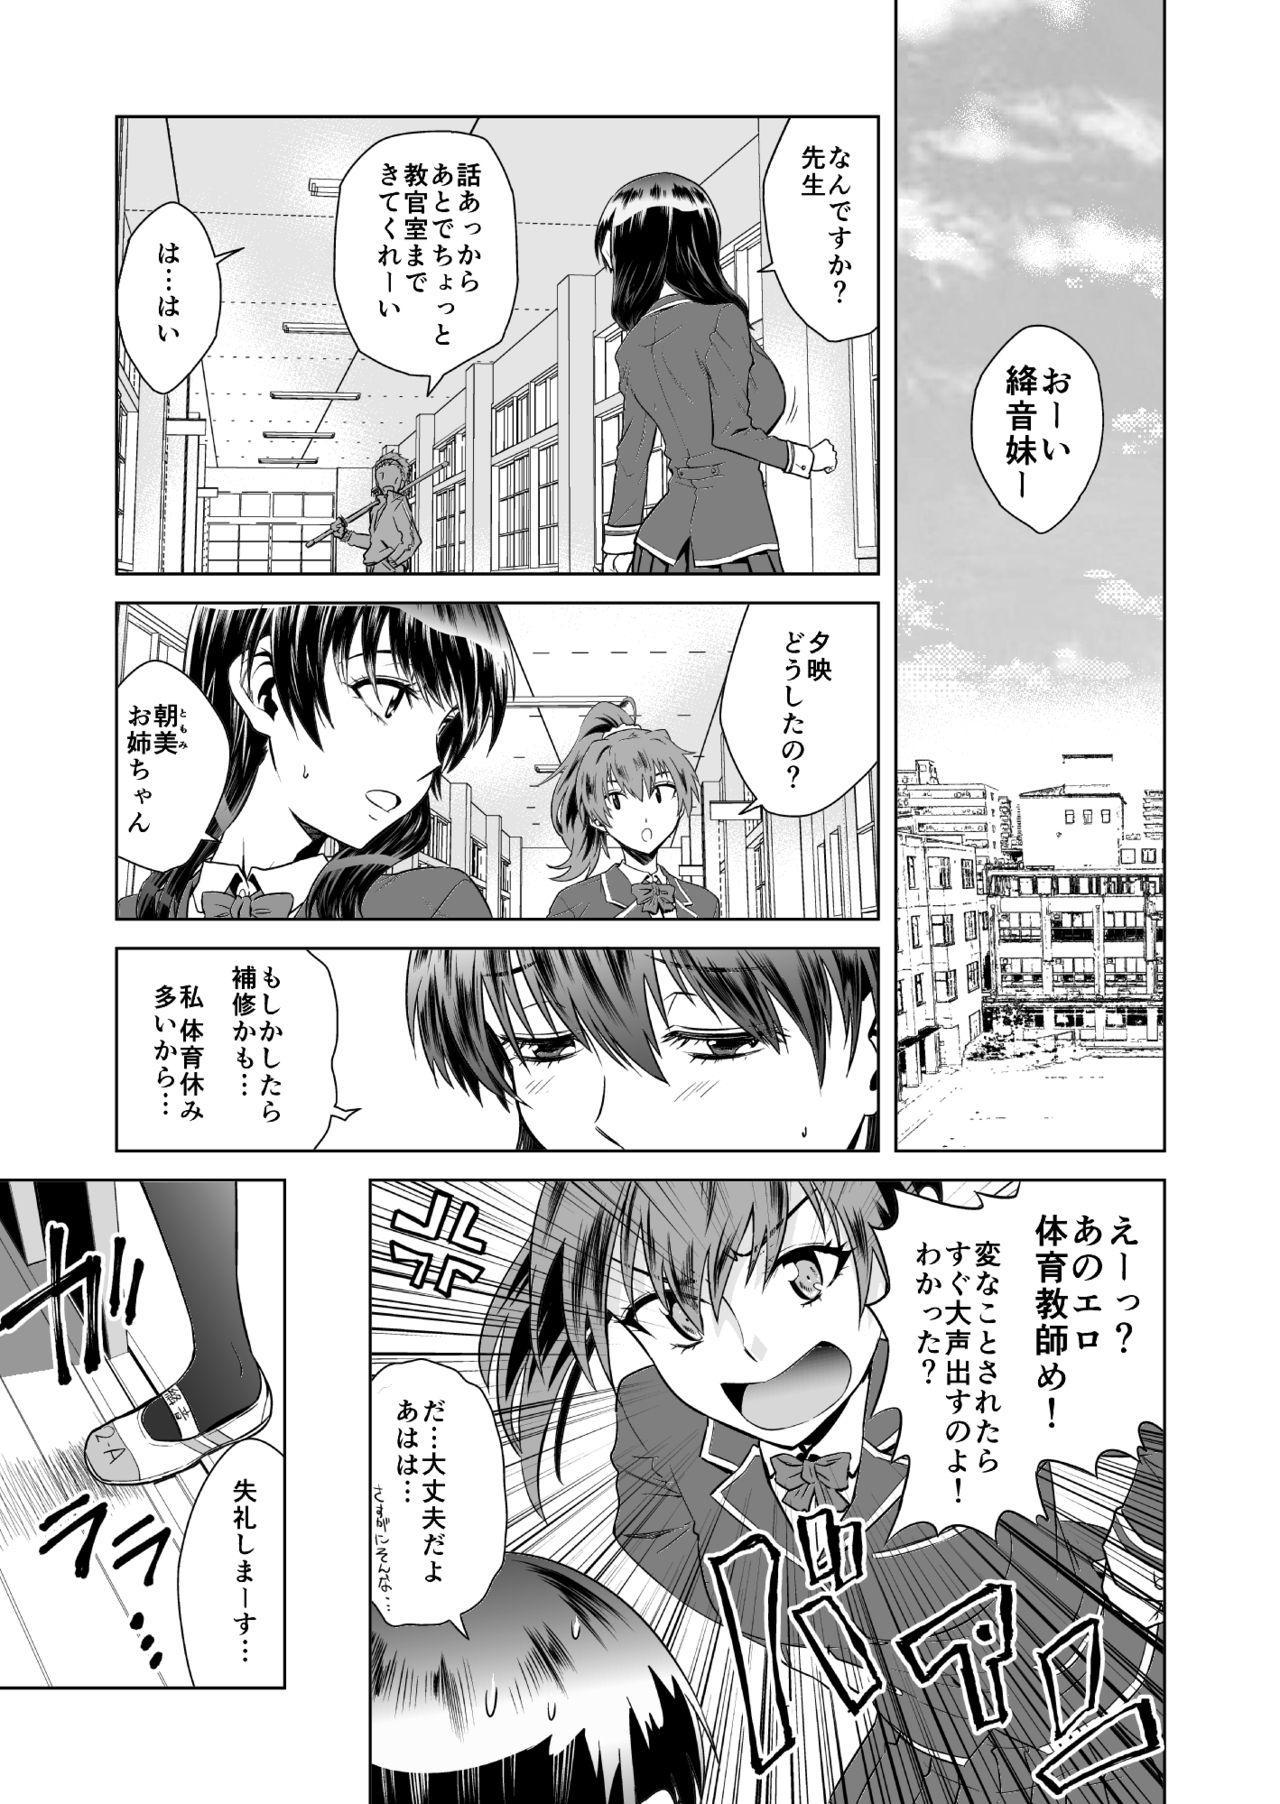 Akaneiro no Joukei 7